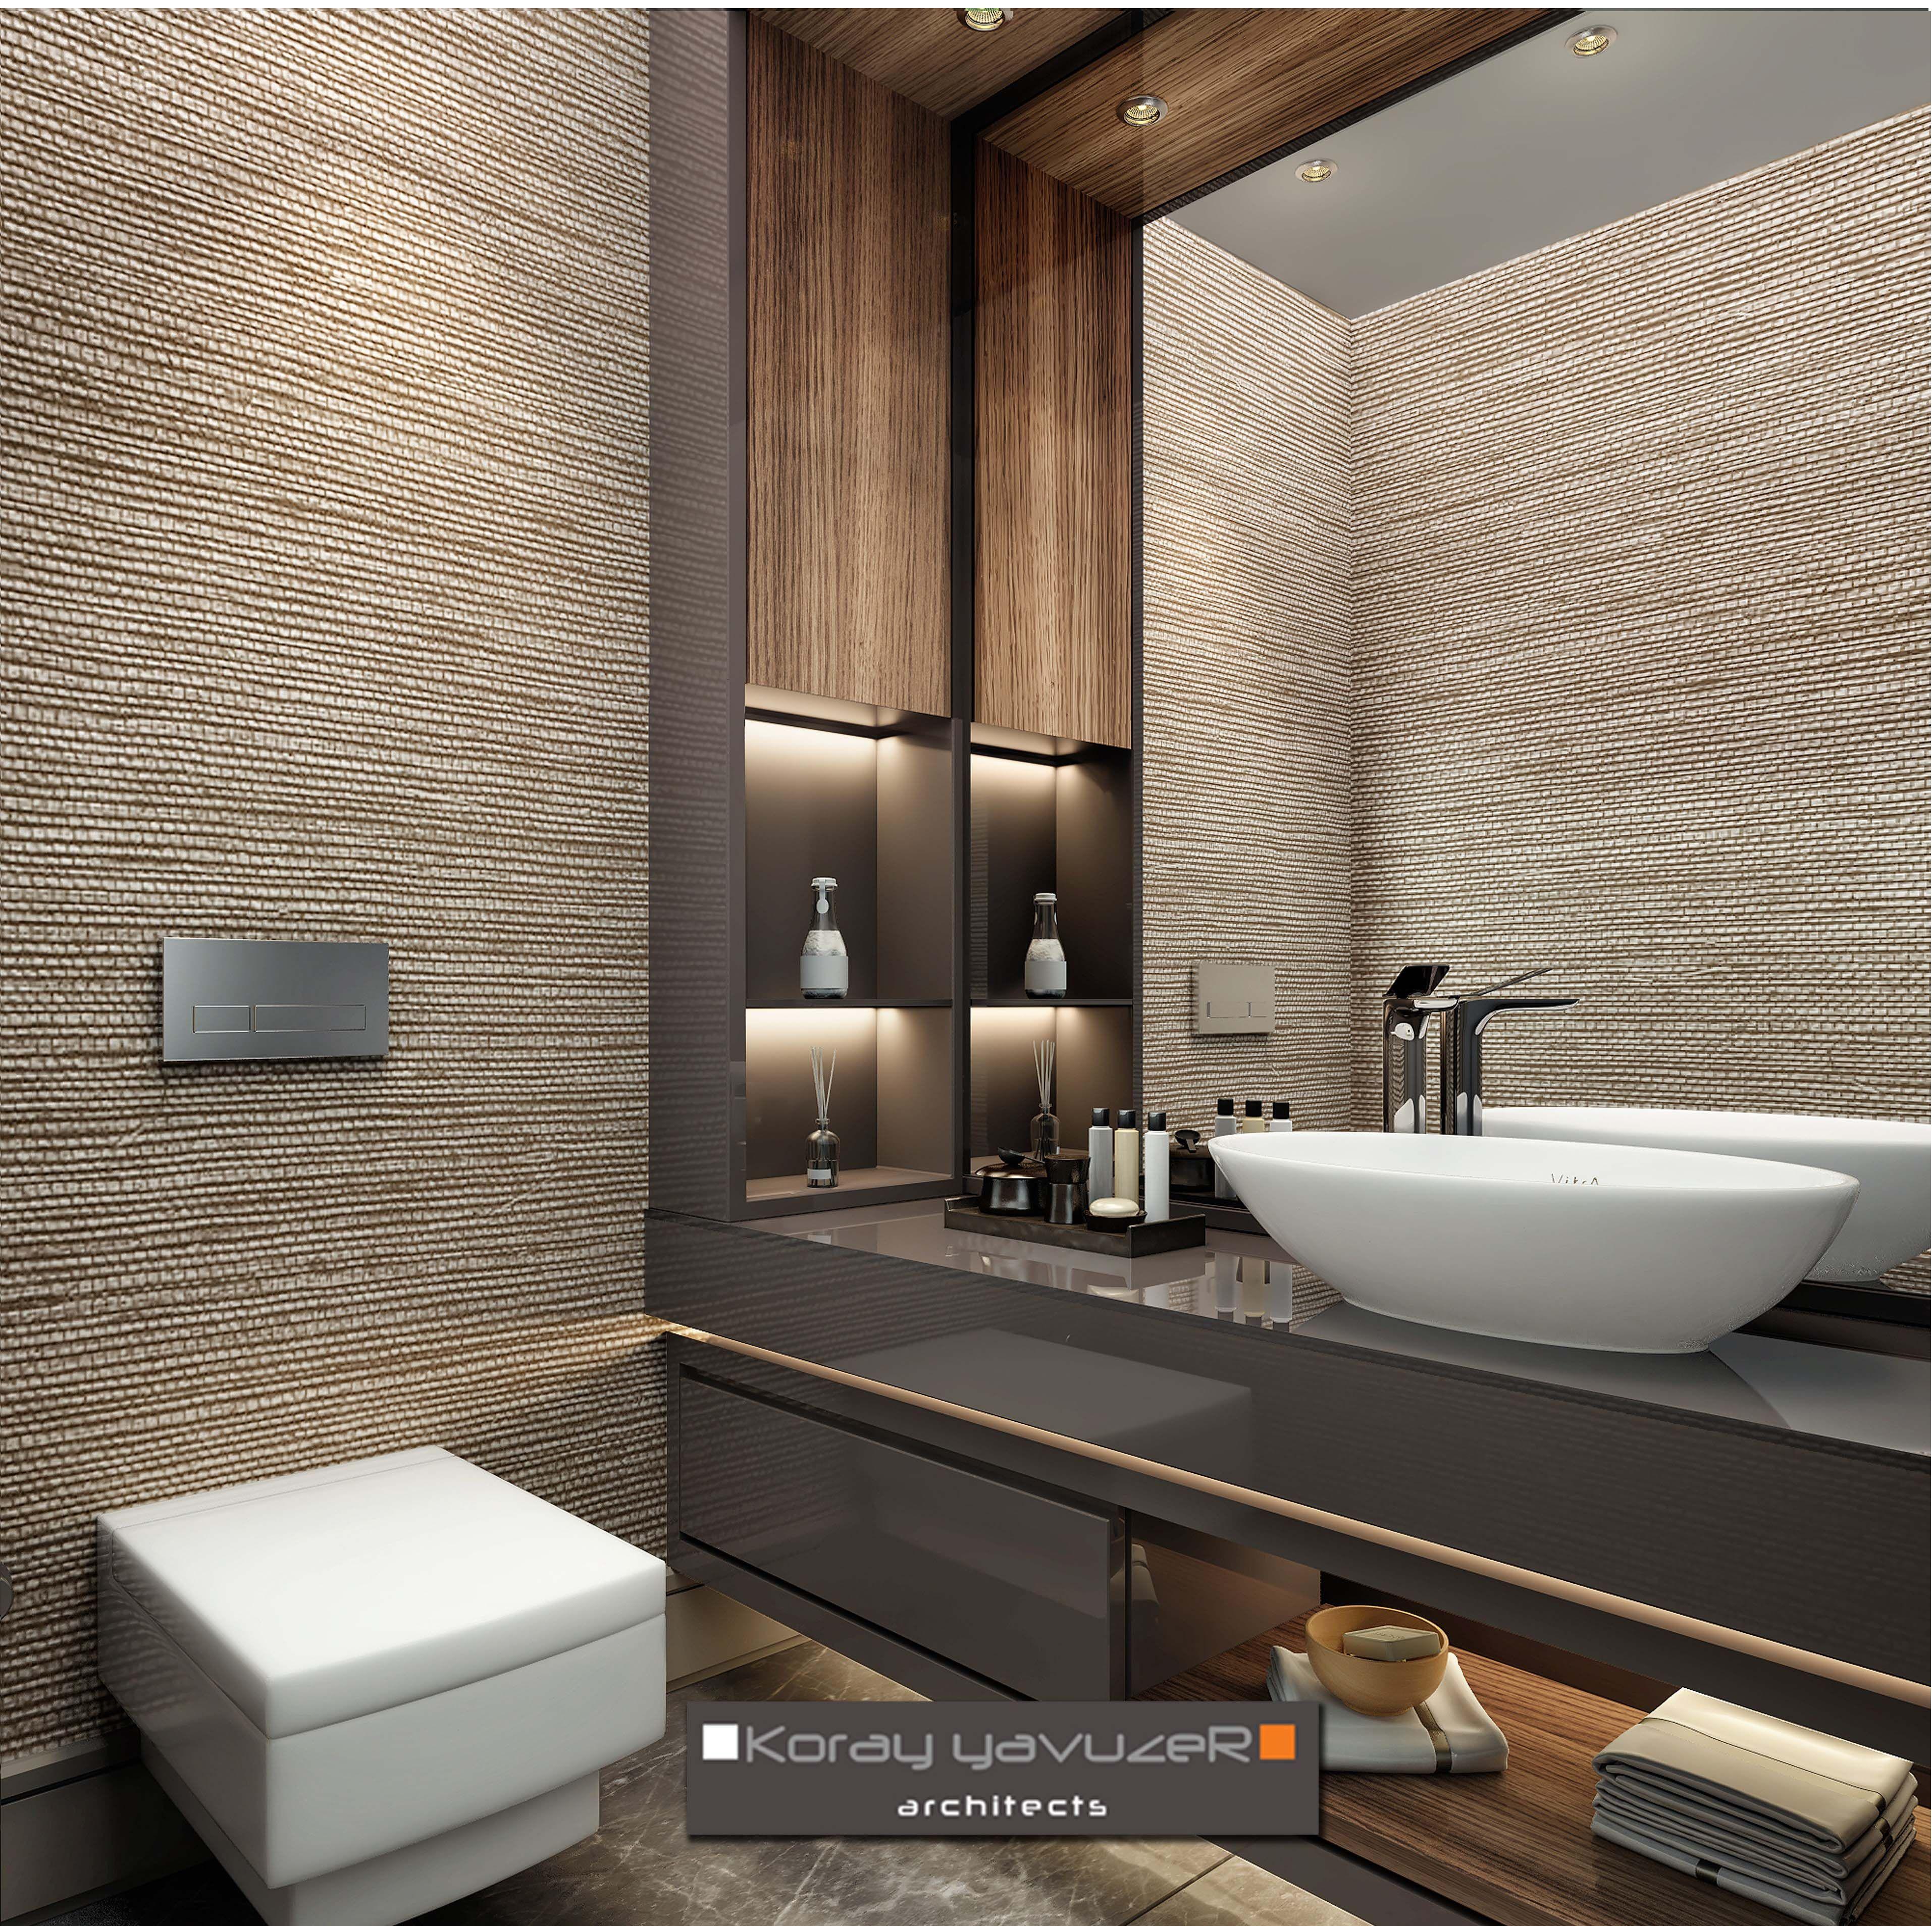 Pin by Tatyana Shekhovtsova on Bathroom in 2019 | Washroom ... on Model Toilet Design  id=57440